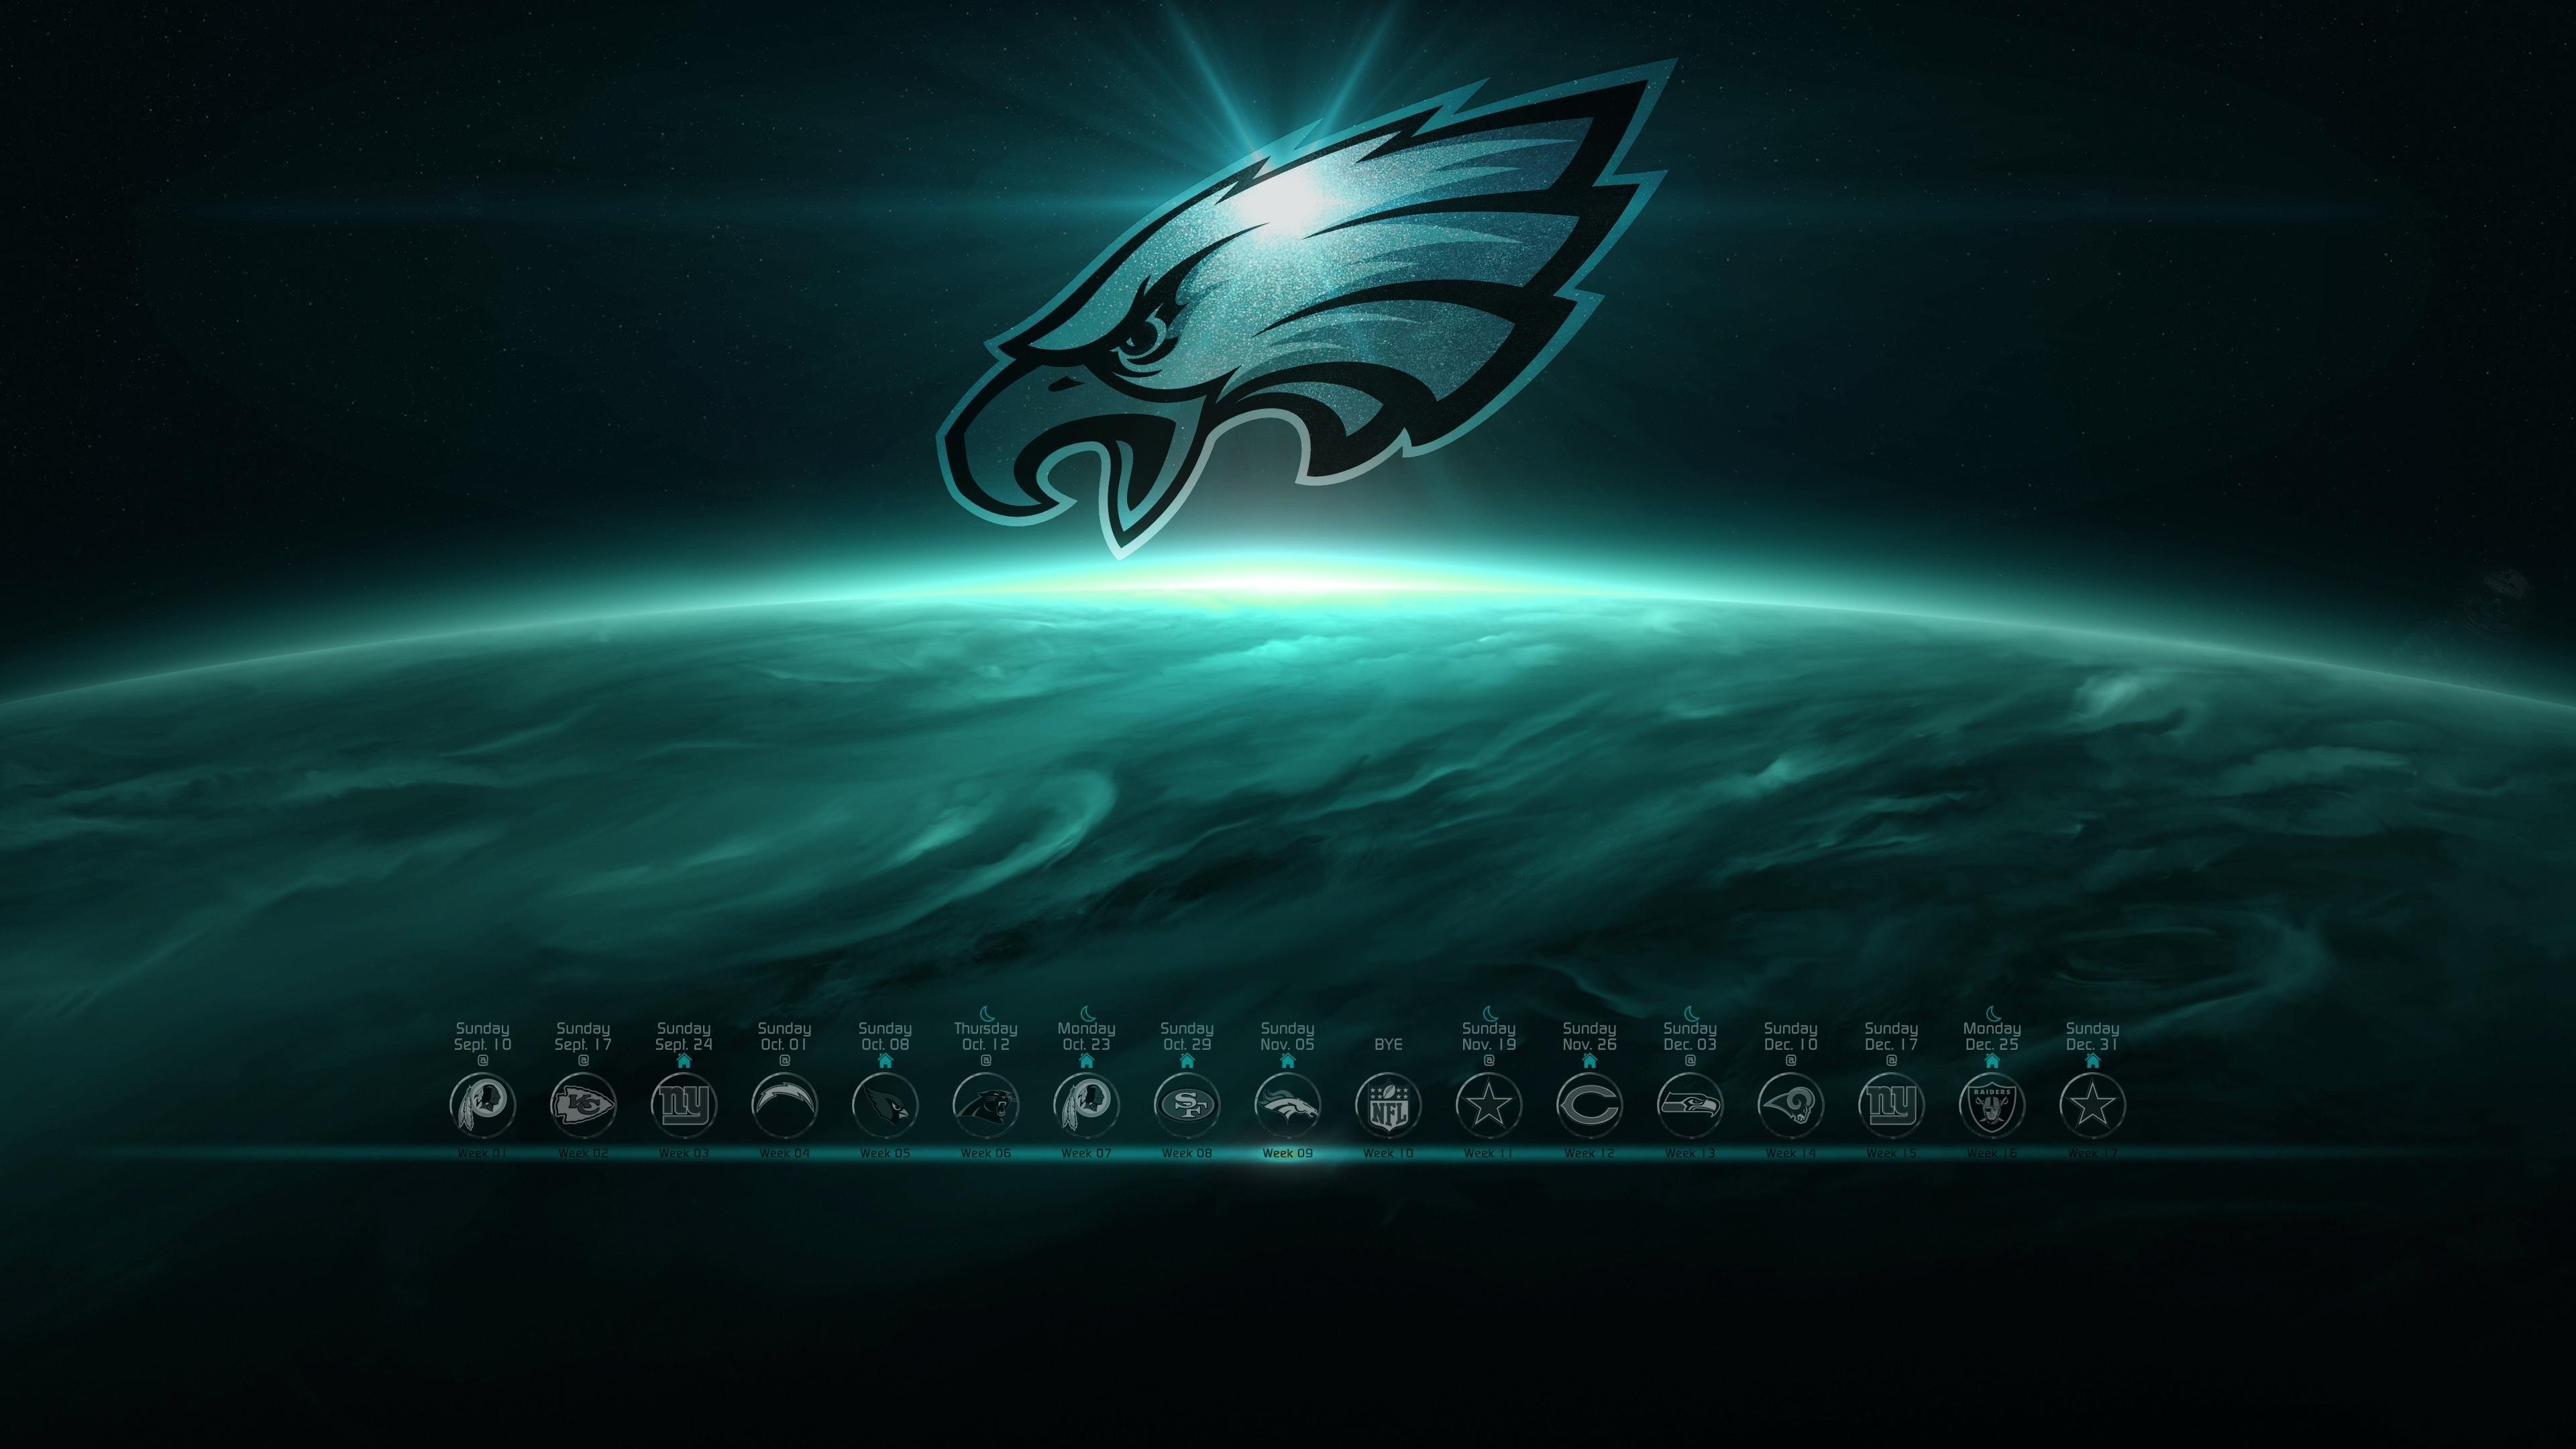 Philadelphia Eagles 2018 Schedule Wallpaper (56+ Images